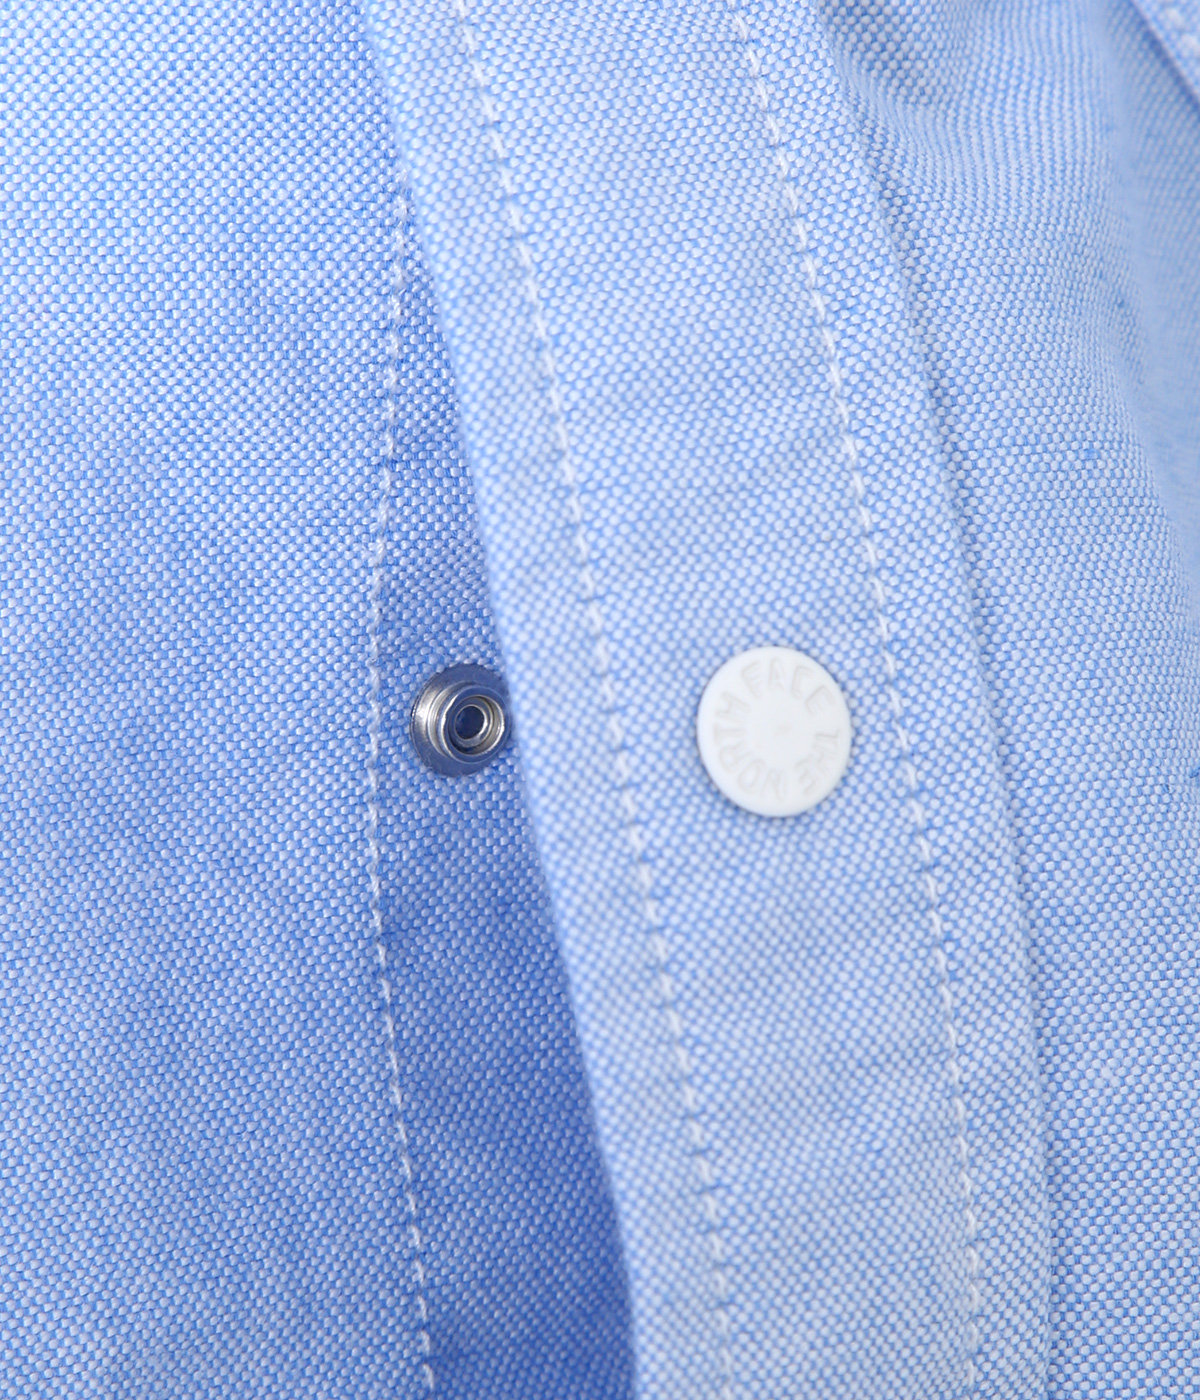 Cotton Polyester OX B.D. Big H/S Shirt